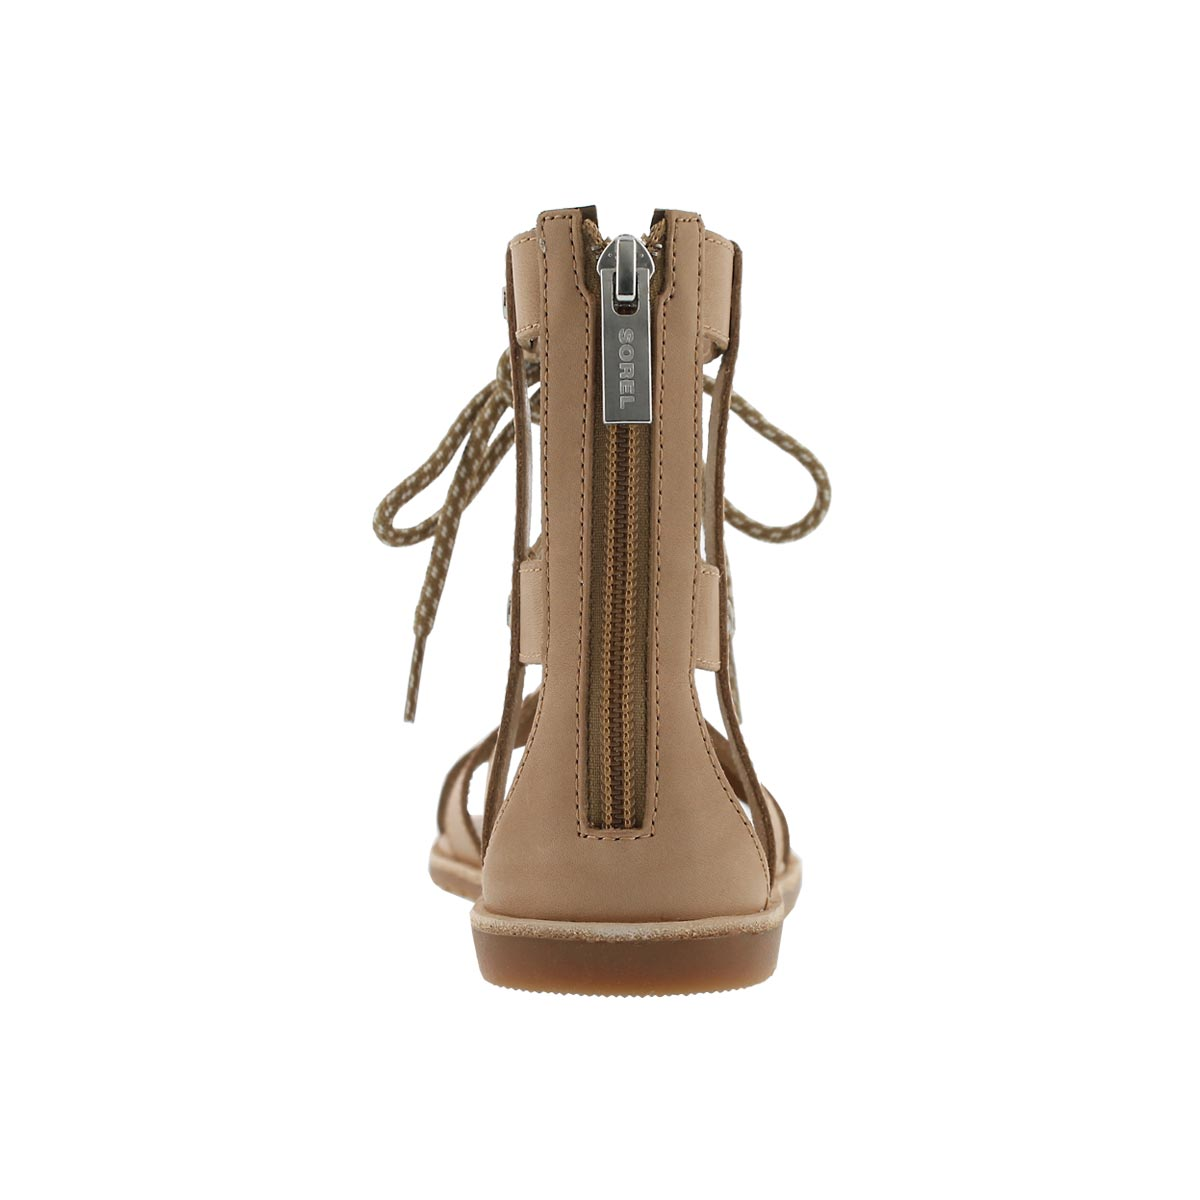 Lds Ella Lace Up sahara casual sandal